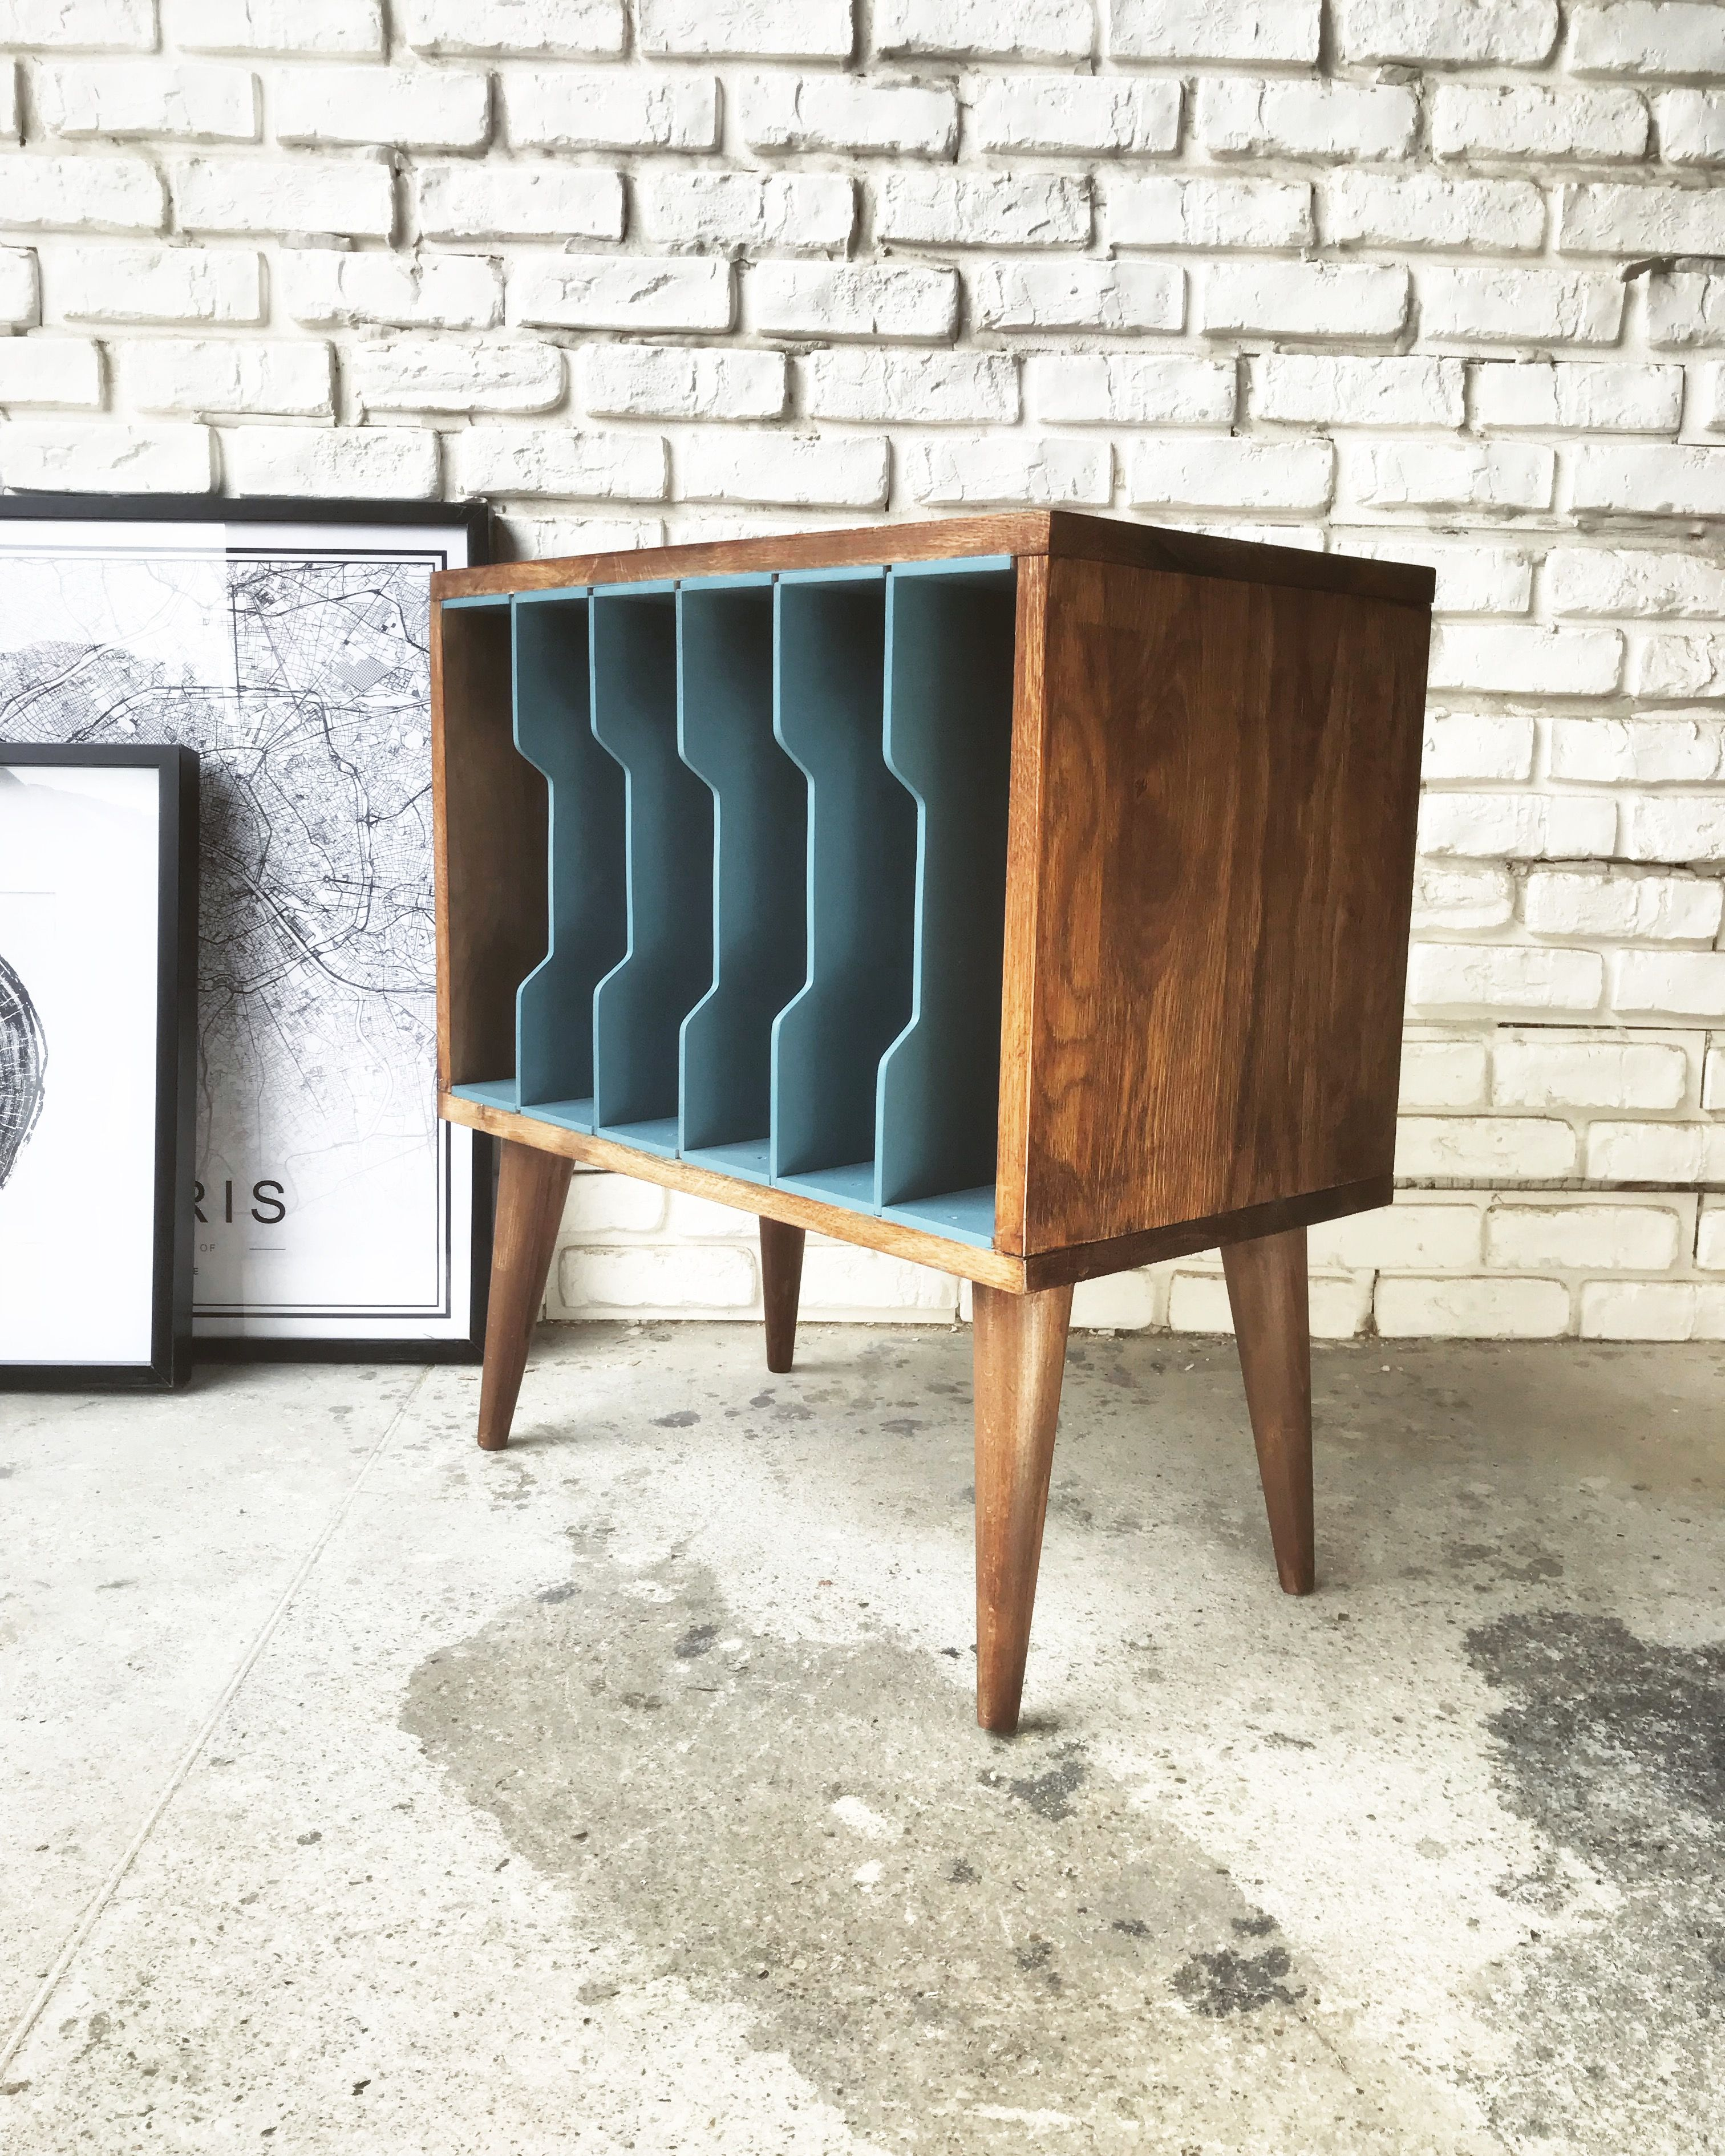 meuble rangement vinyles magazines vintage scandinave danois made in france - Meuble Danois